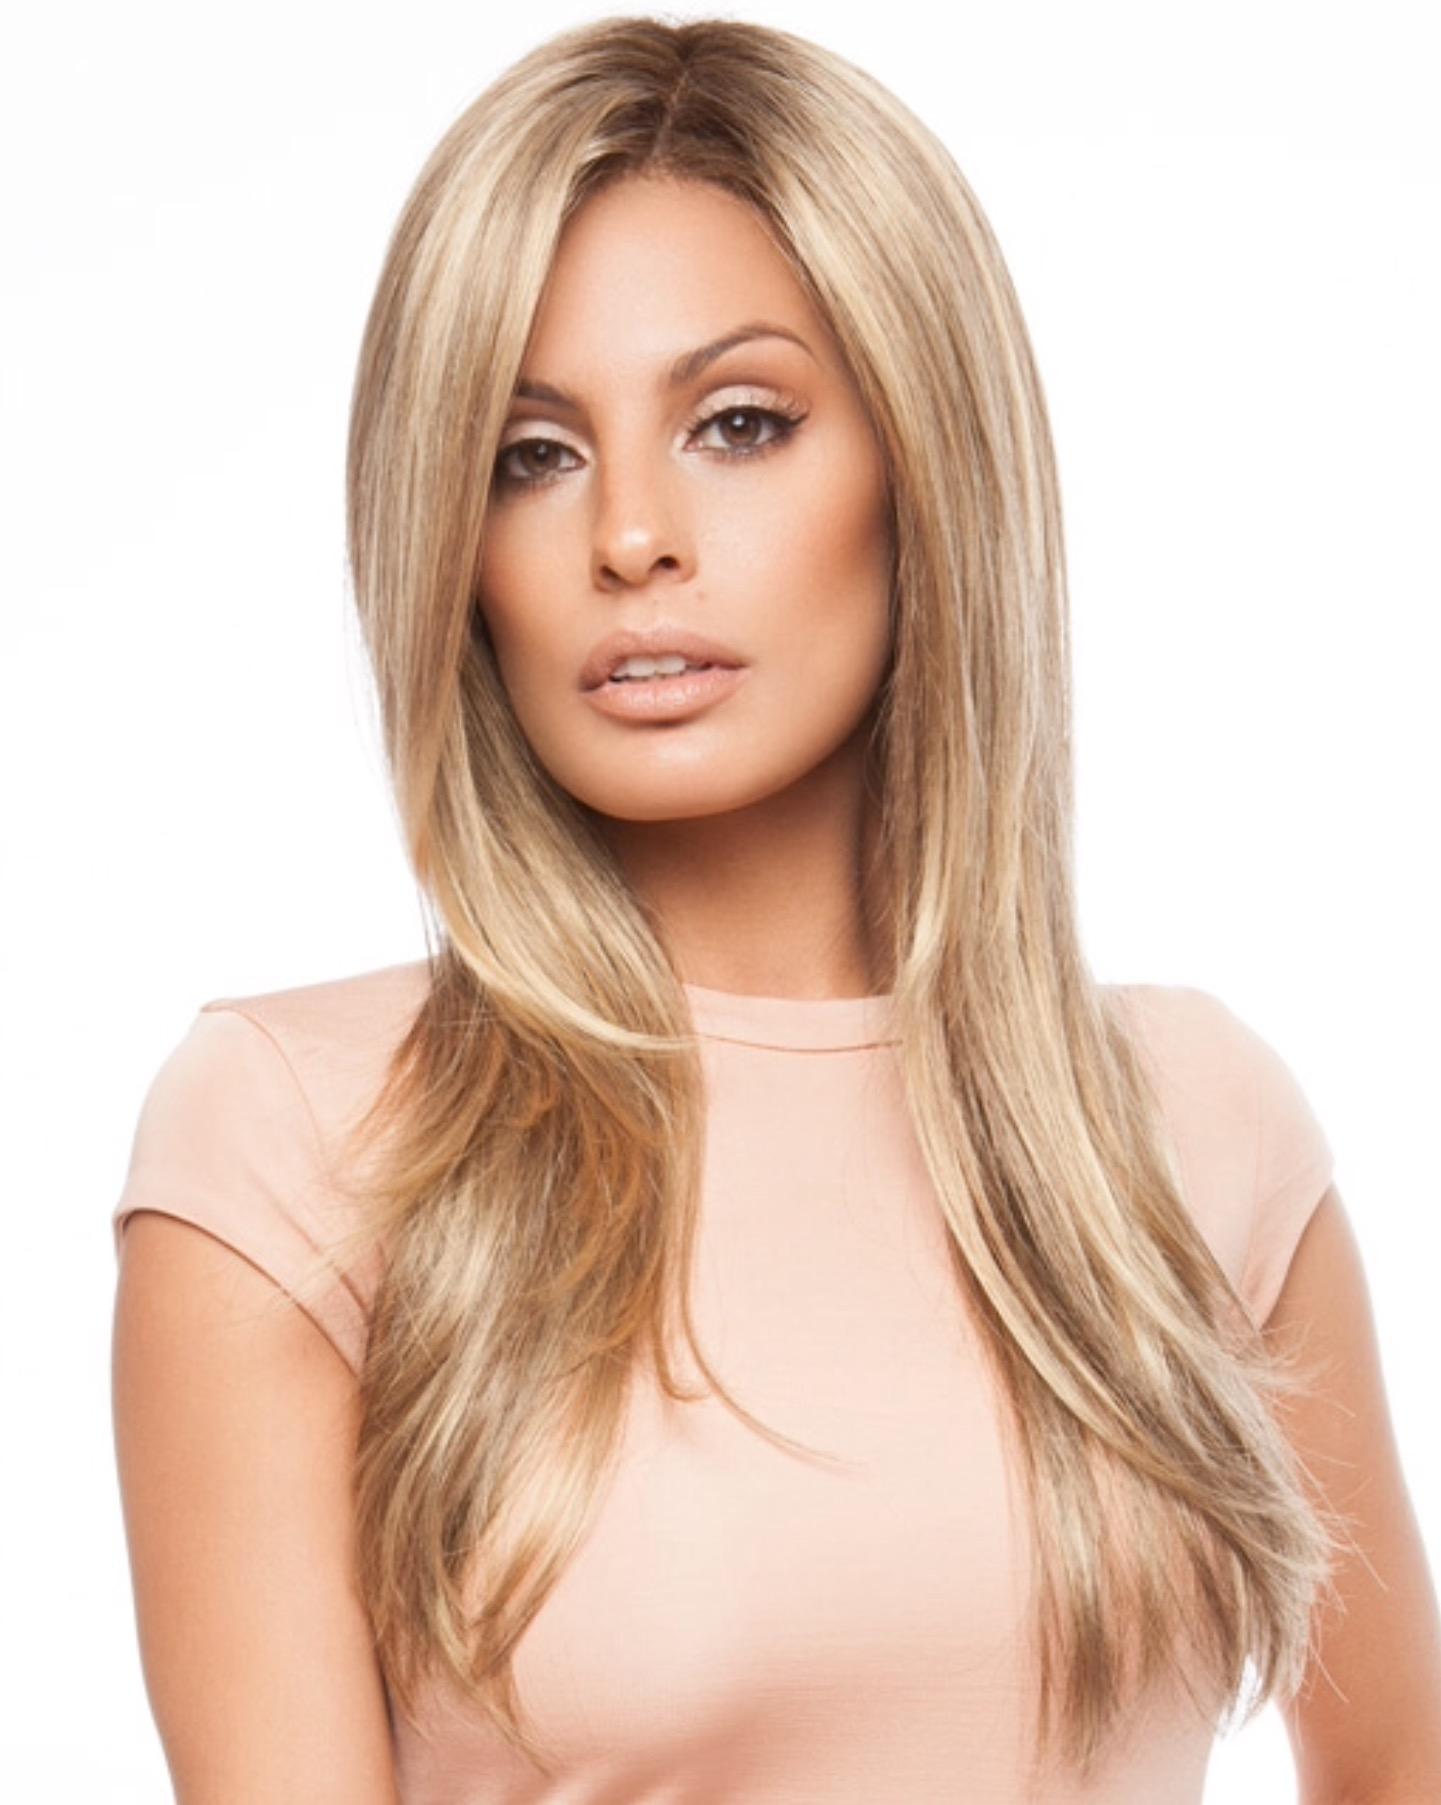 Buy Zara Large SmartLace Wig - Jon Renau